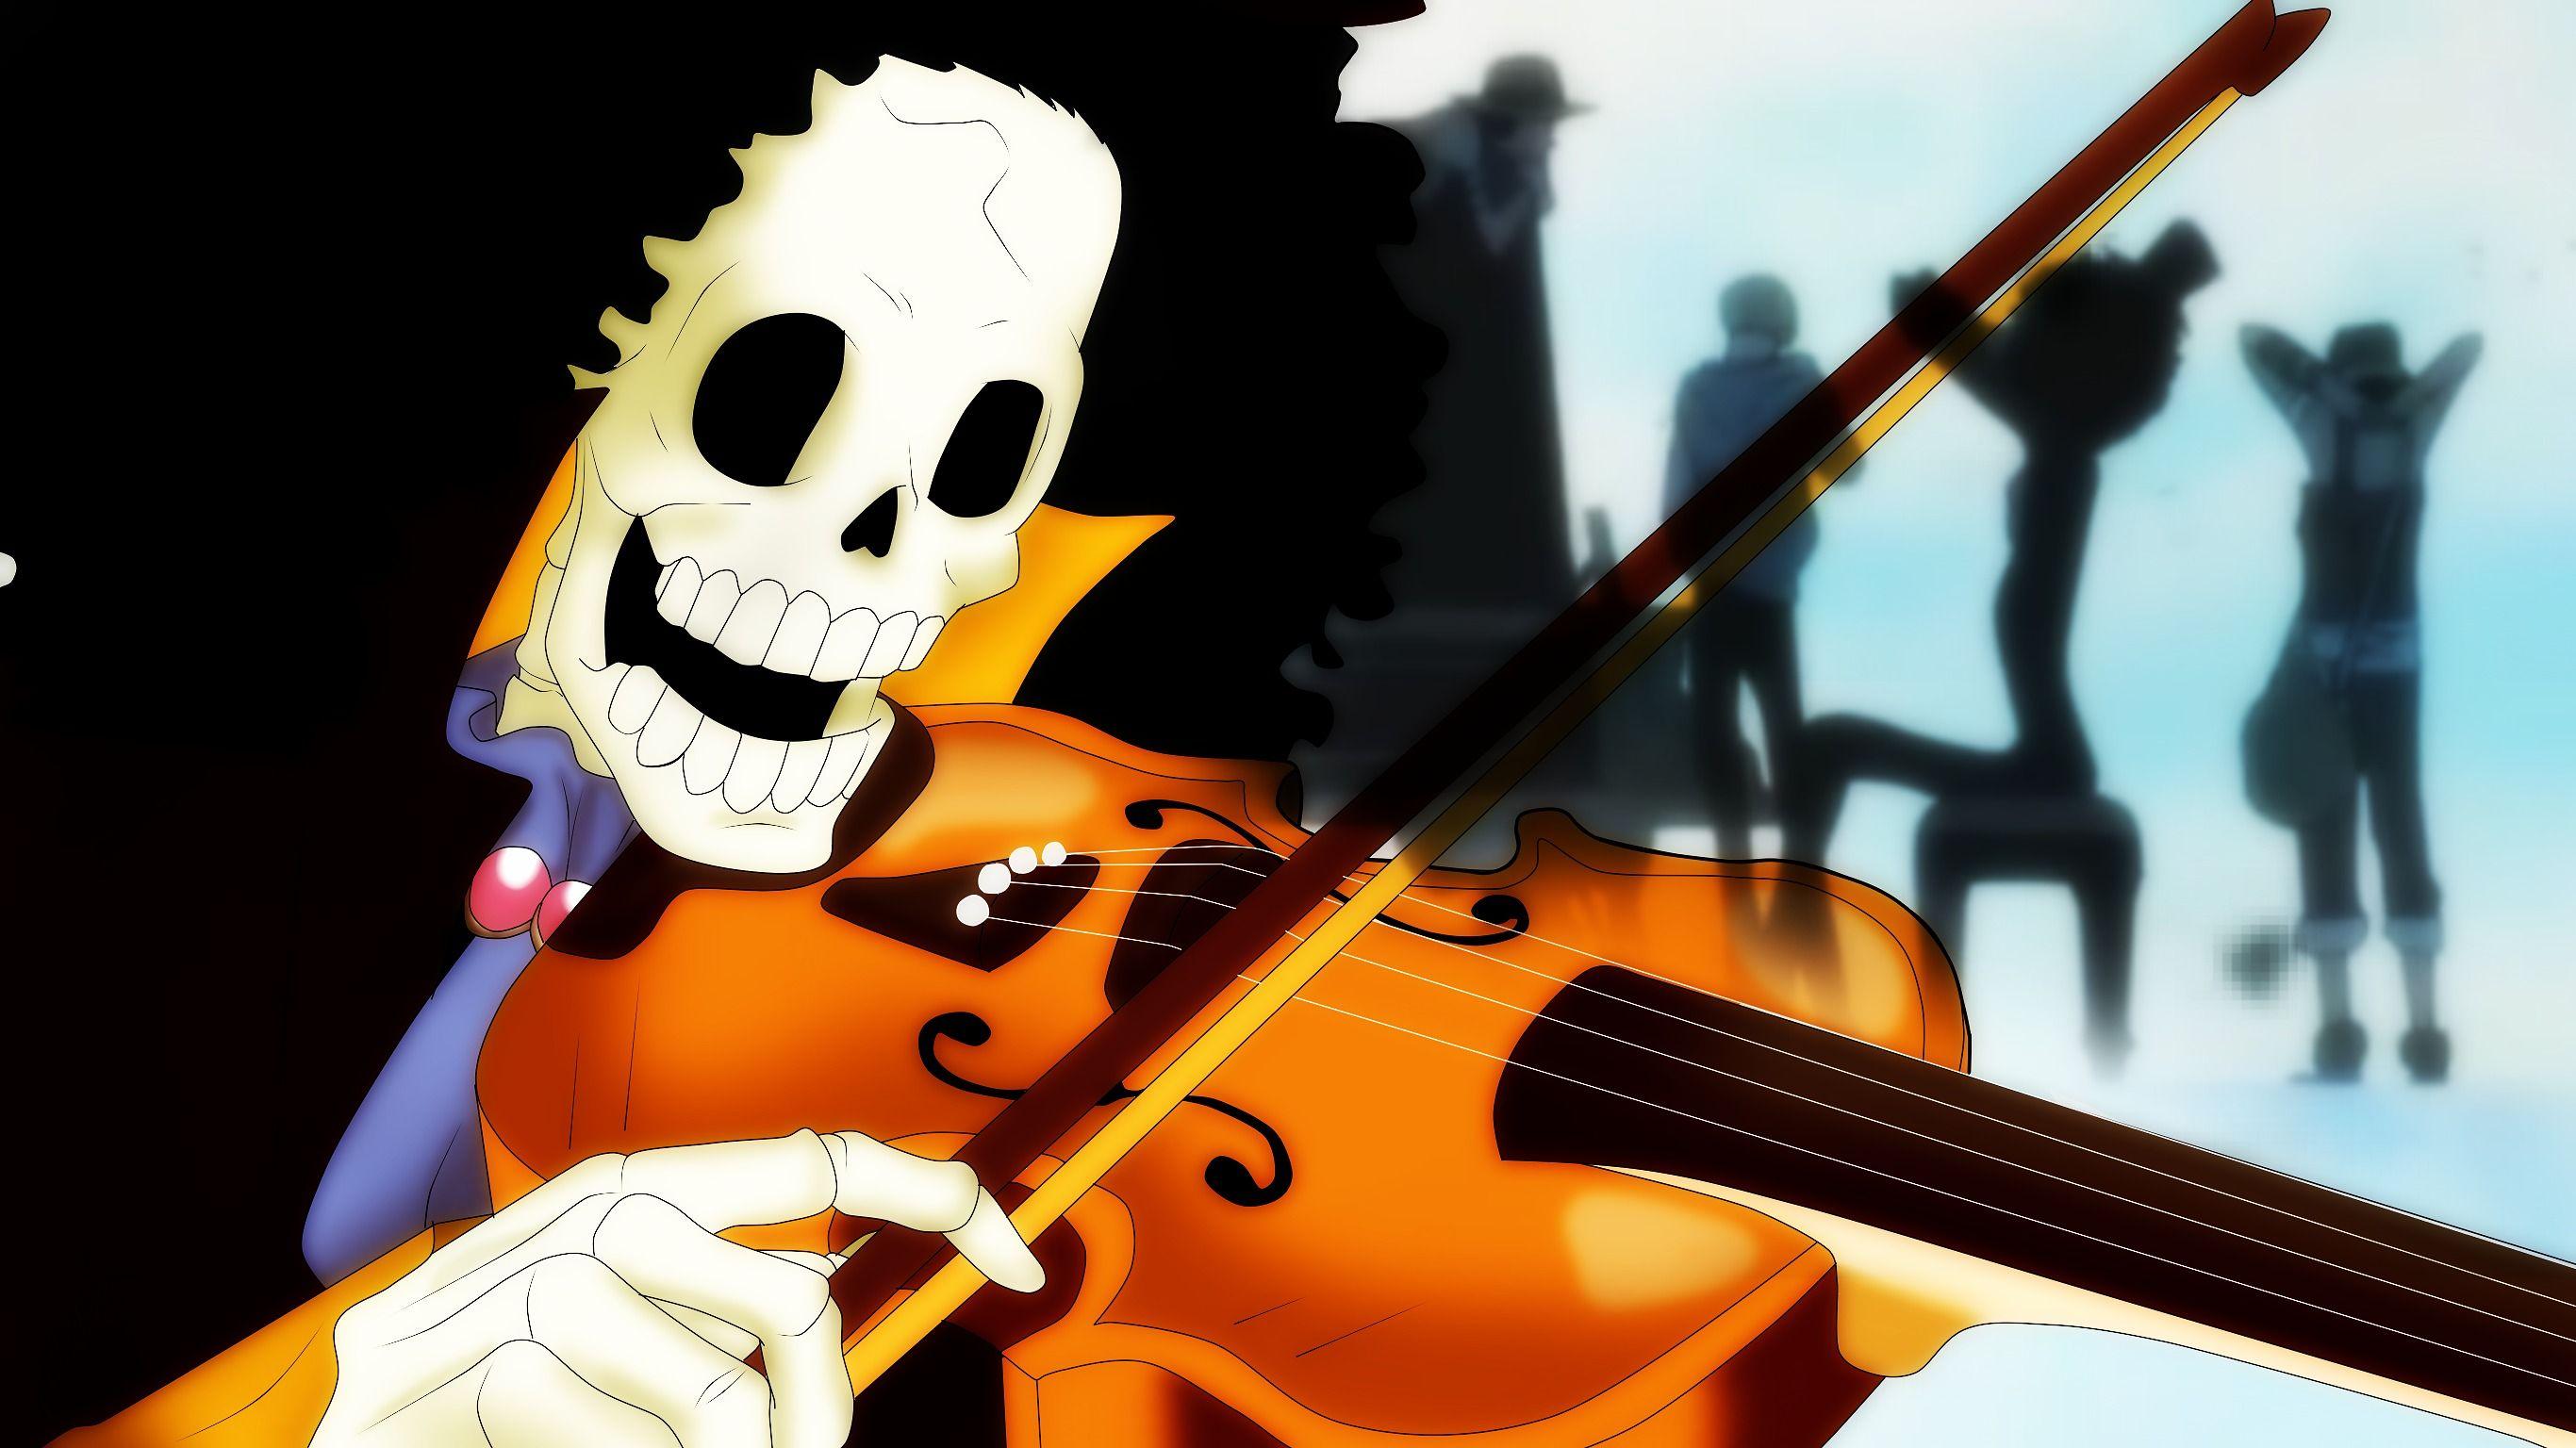 Brook | One Piece | One Piece | Pinterest | Anime, Otaku and Manga